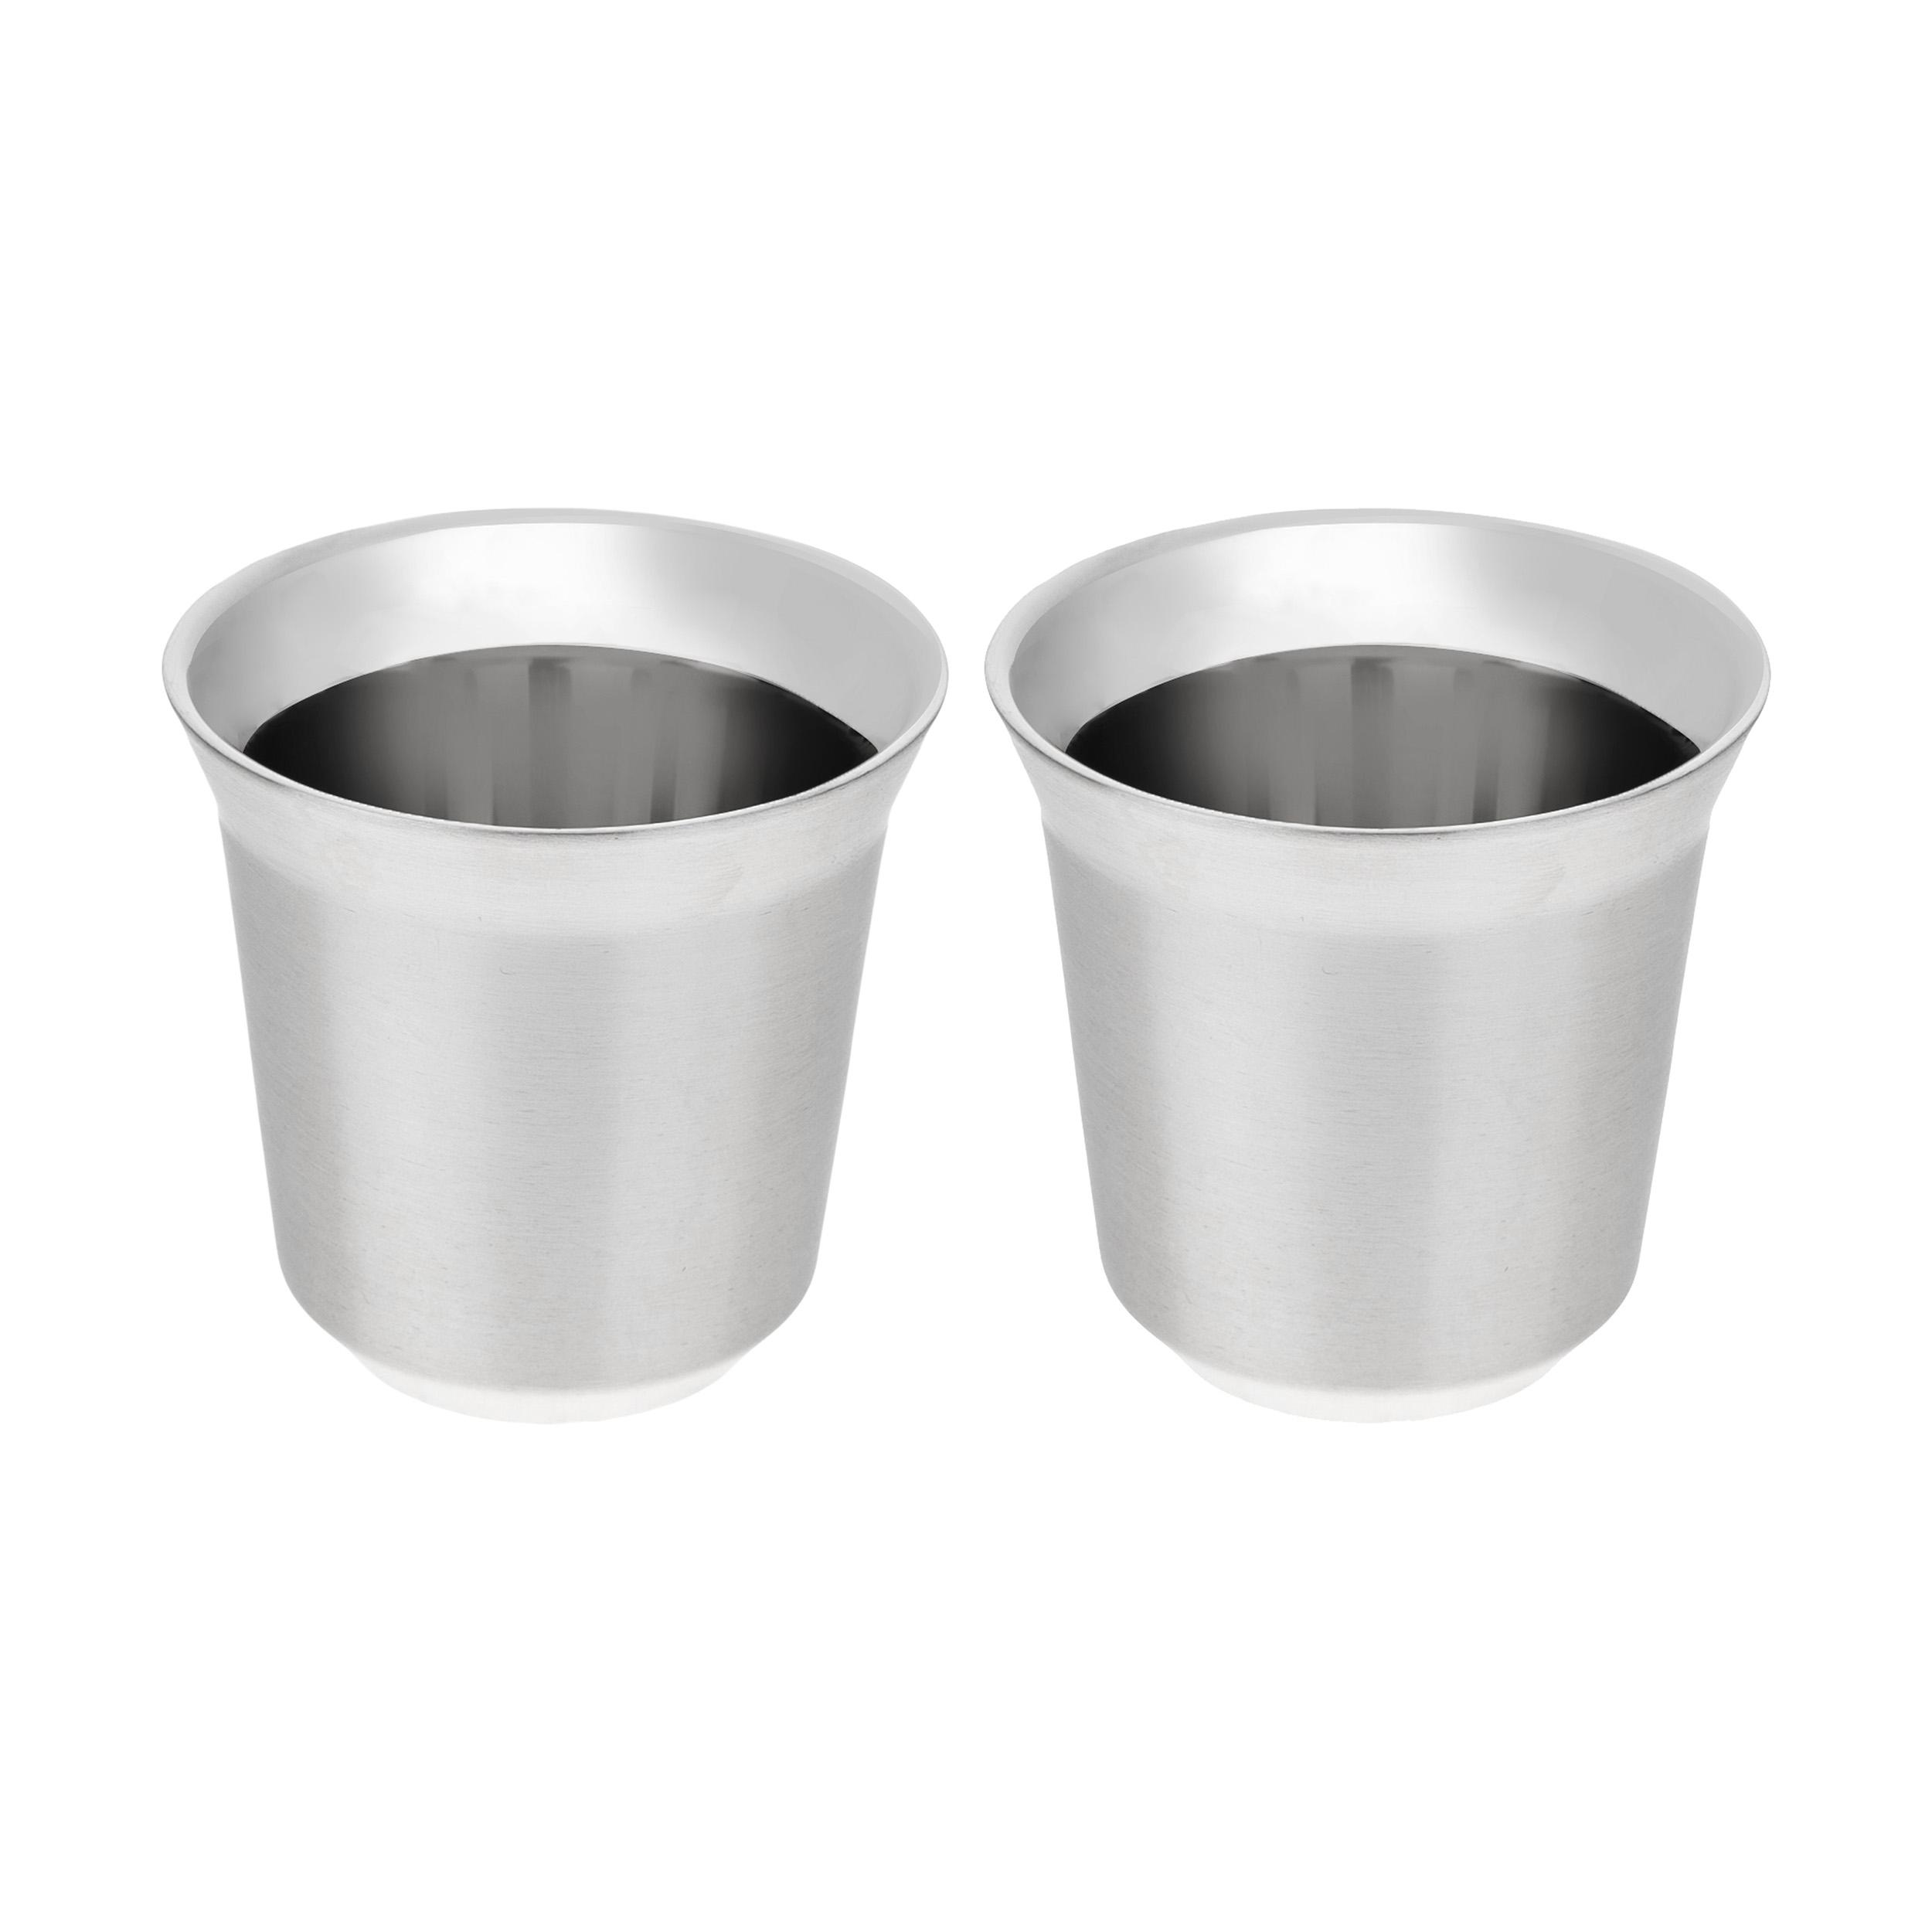 فنجان  ریکپس مدل ۲۰۲۰ بسته  ۲ عددی